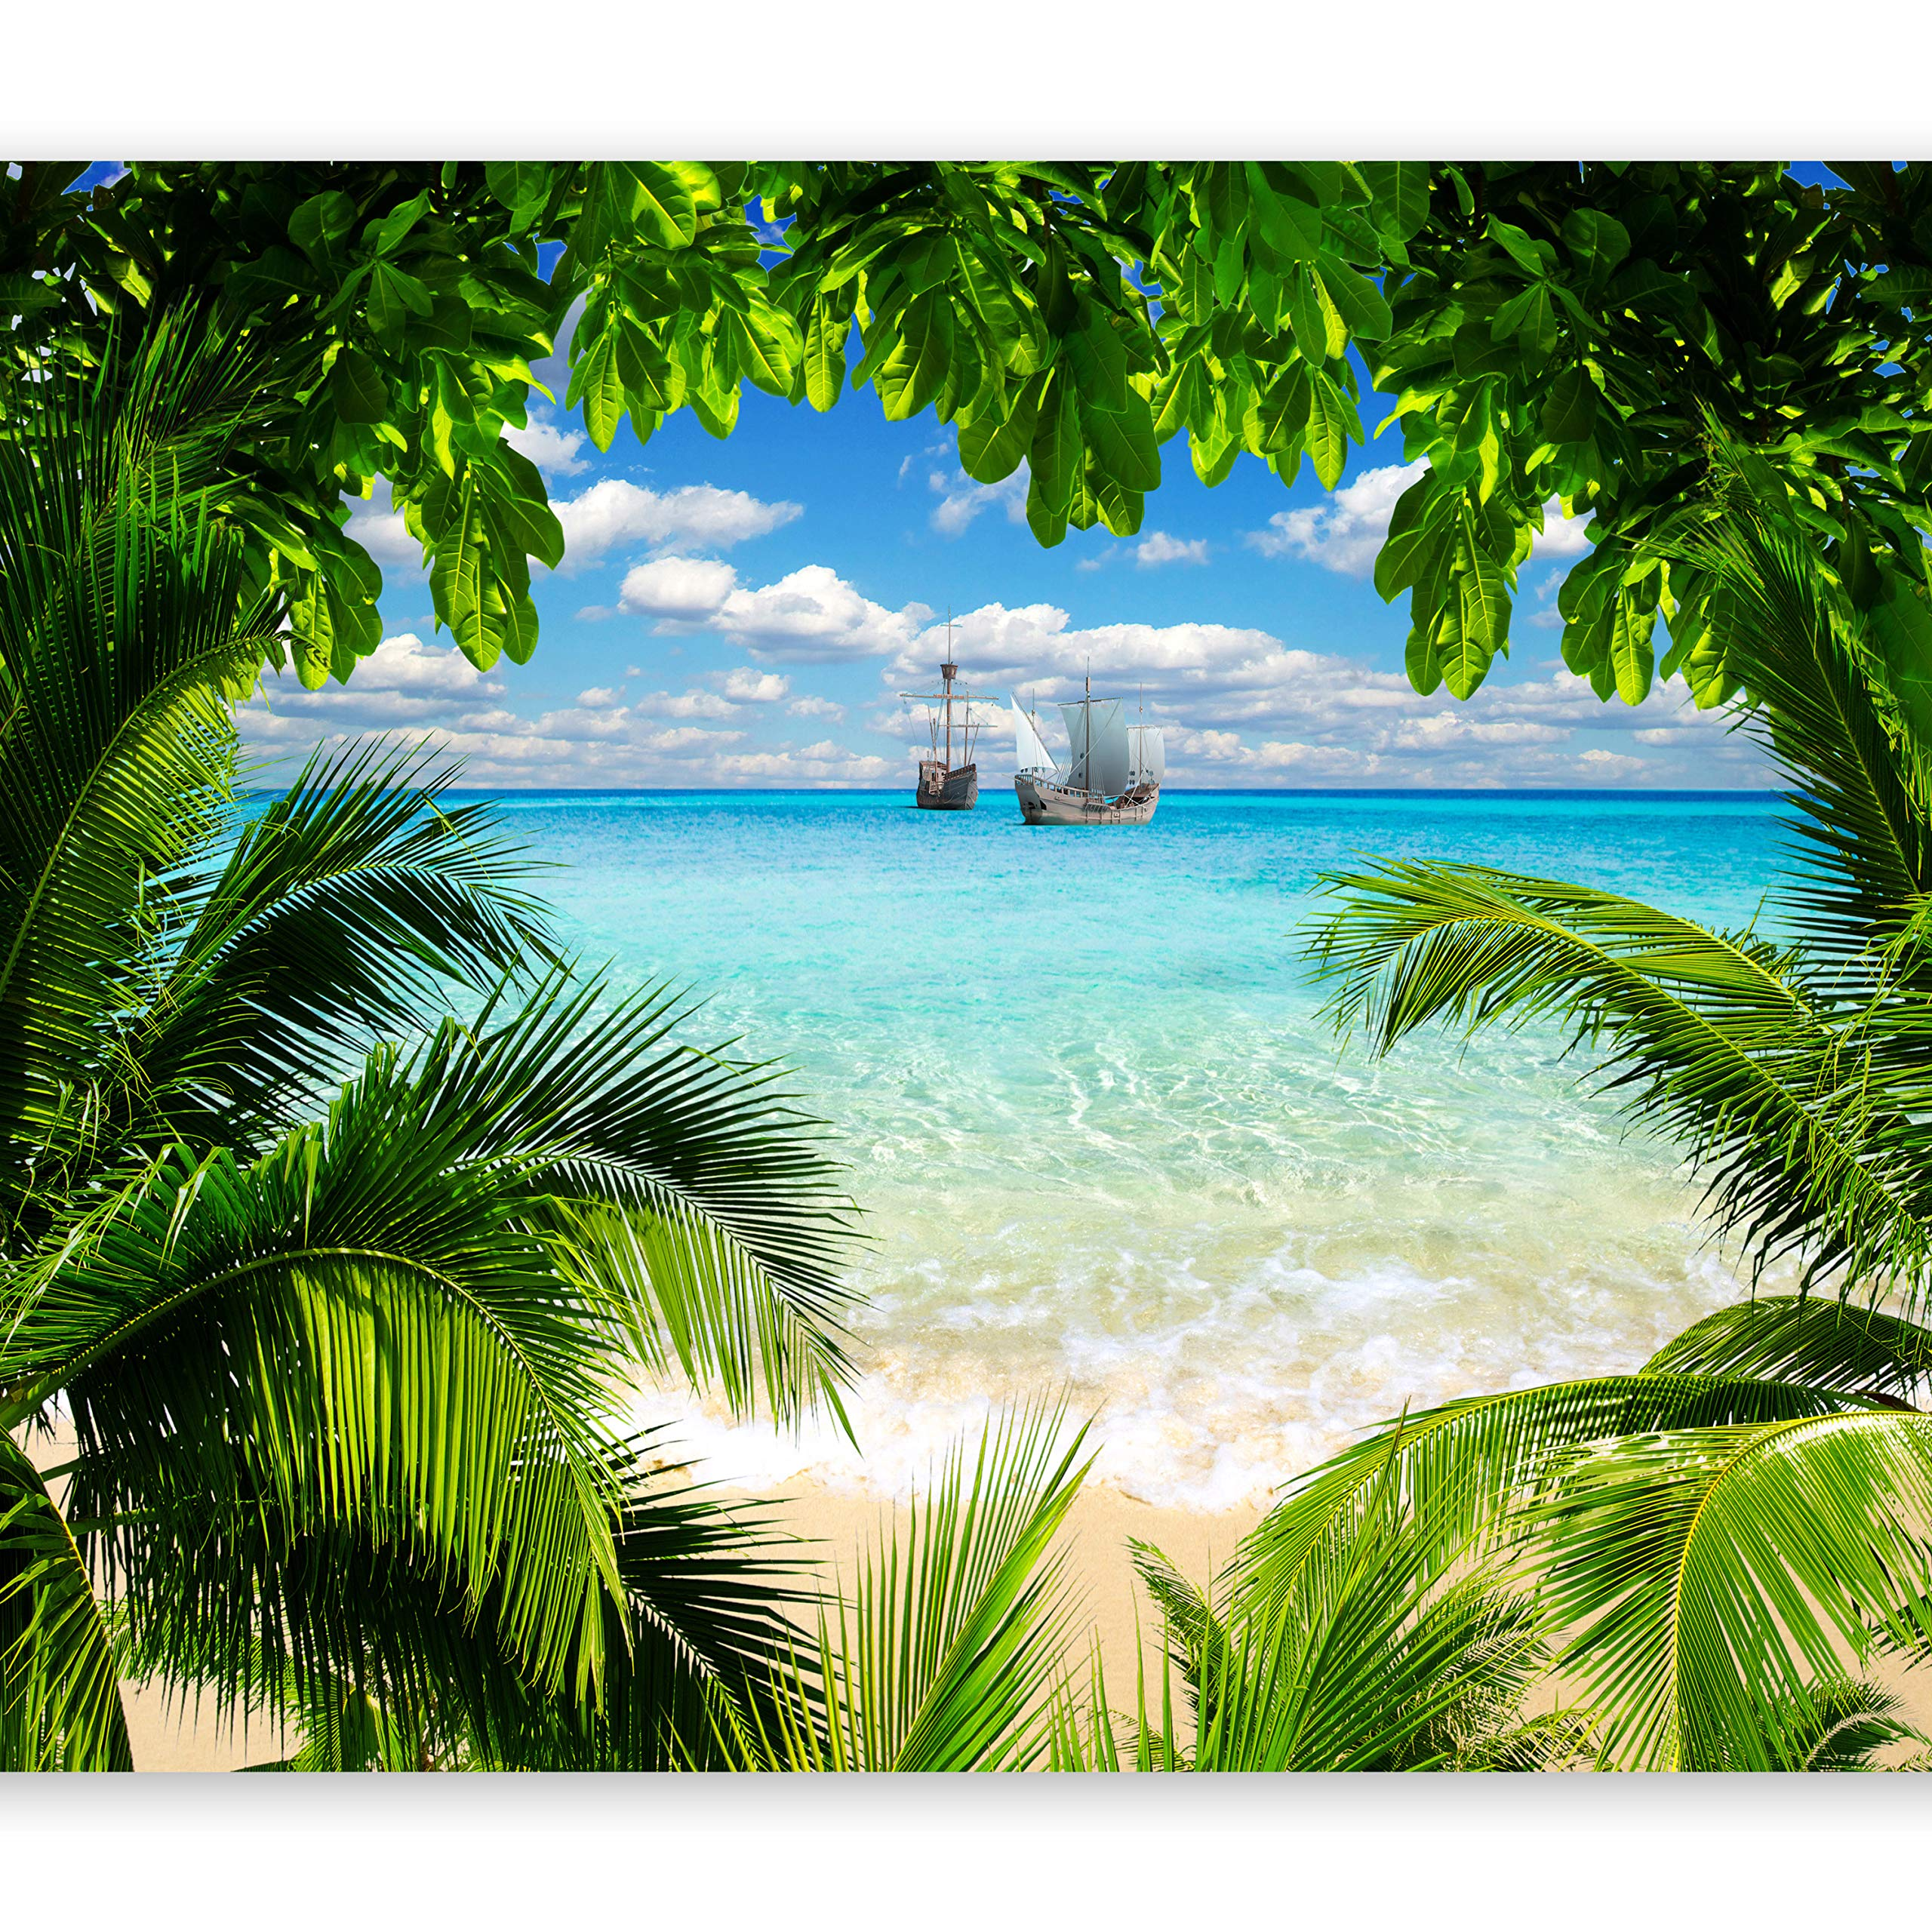 artgeist Photo Wallpape Beach Sea 135''x101'' XXL Peel and Stick Self-Adhesive Foil Wall Mural Removable Sticker Premium Print Picture Image Design Home Decor c-A-0047-a-a